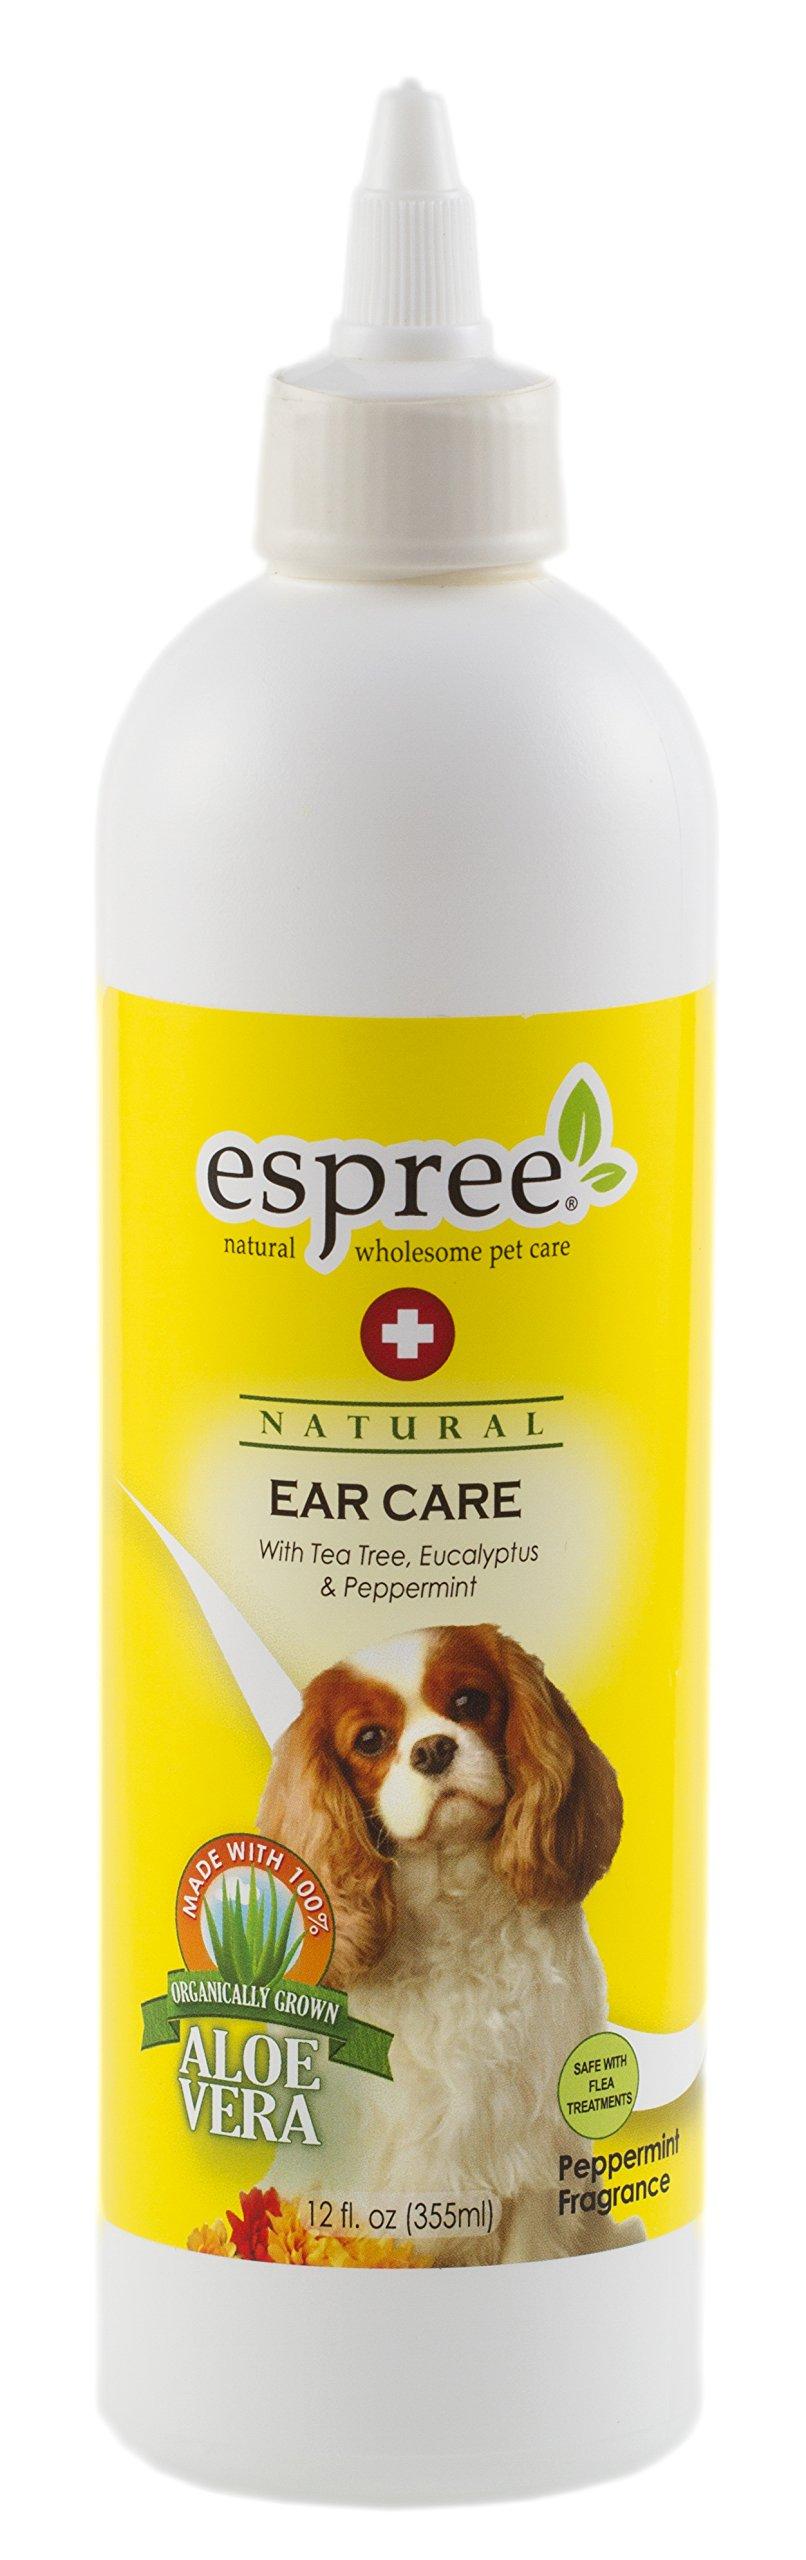 Espree Ear Care Cleaner, 12 oz